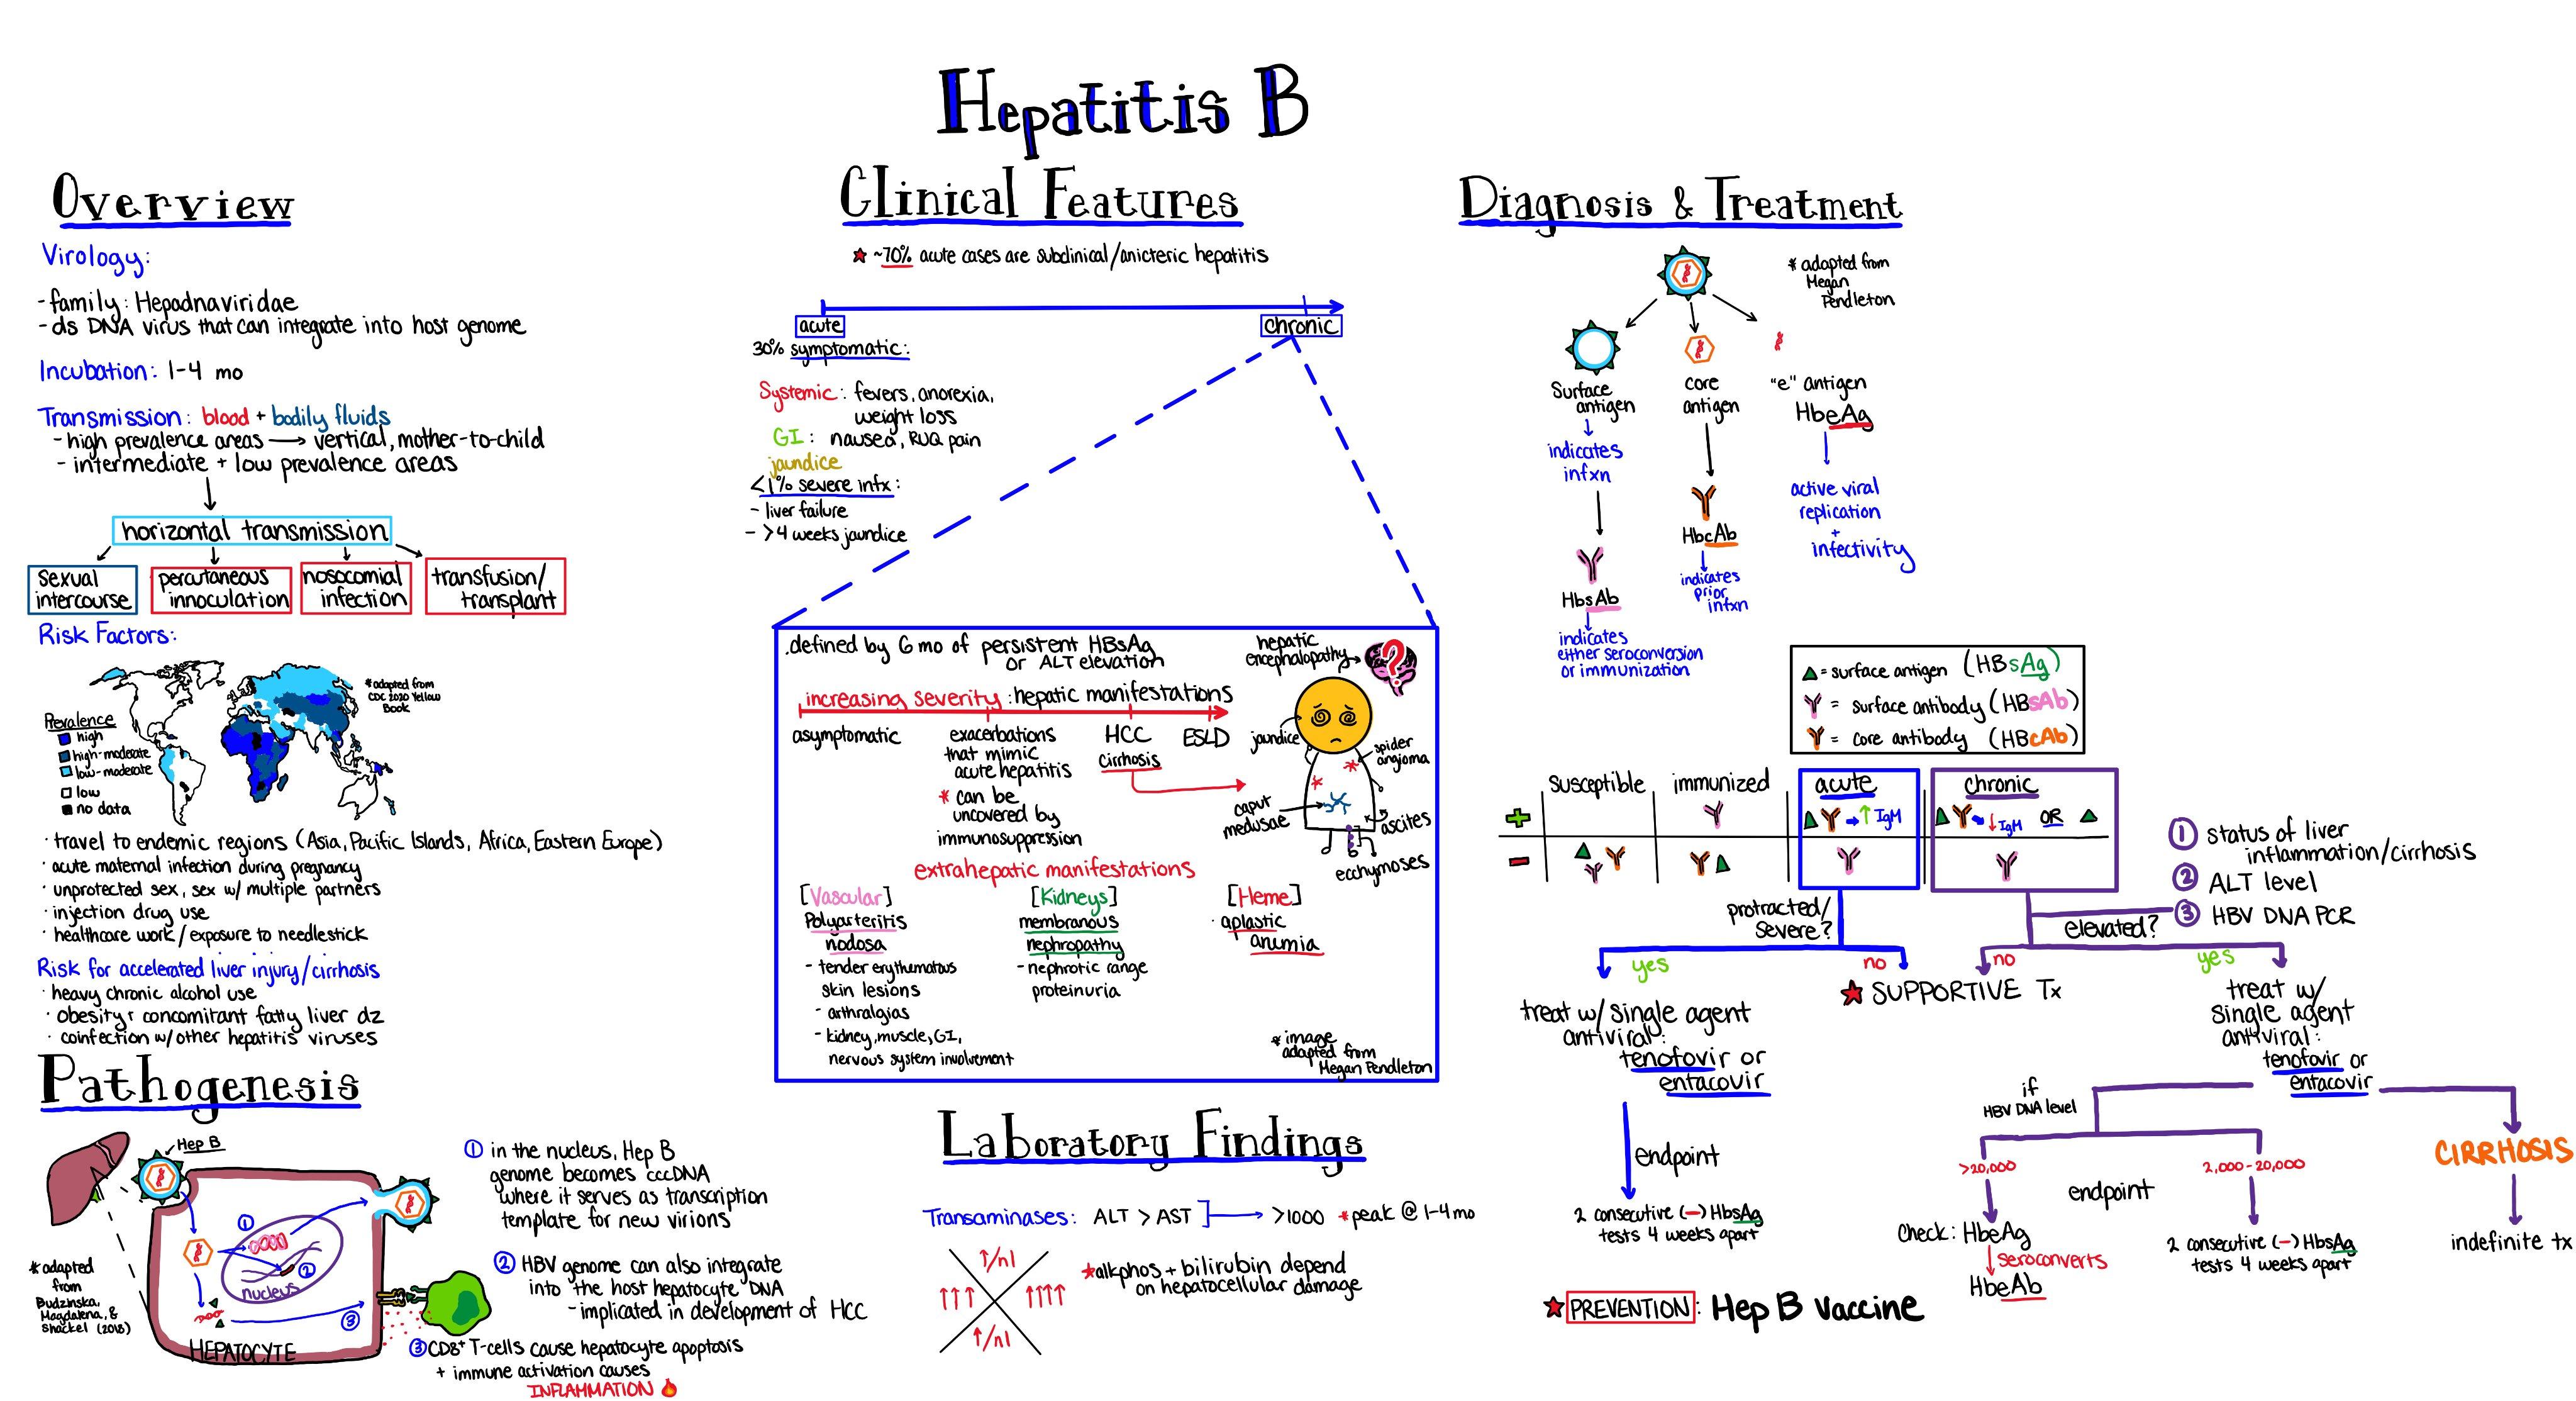 Ciroza hepatica | consilier-dezvoltare-personala.ro